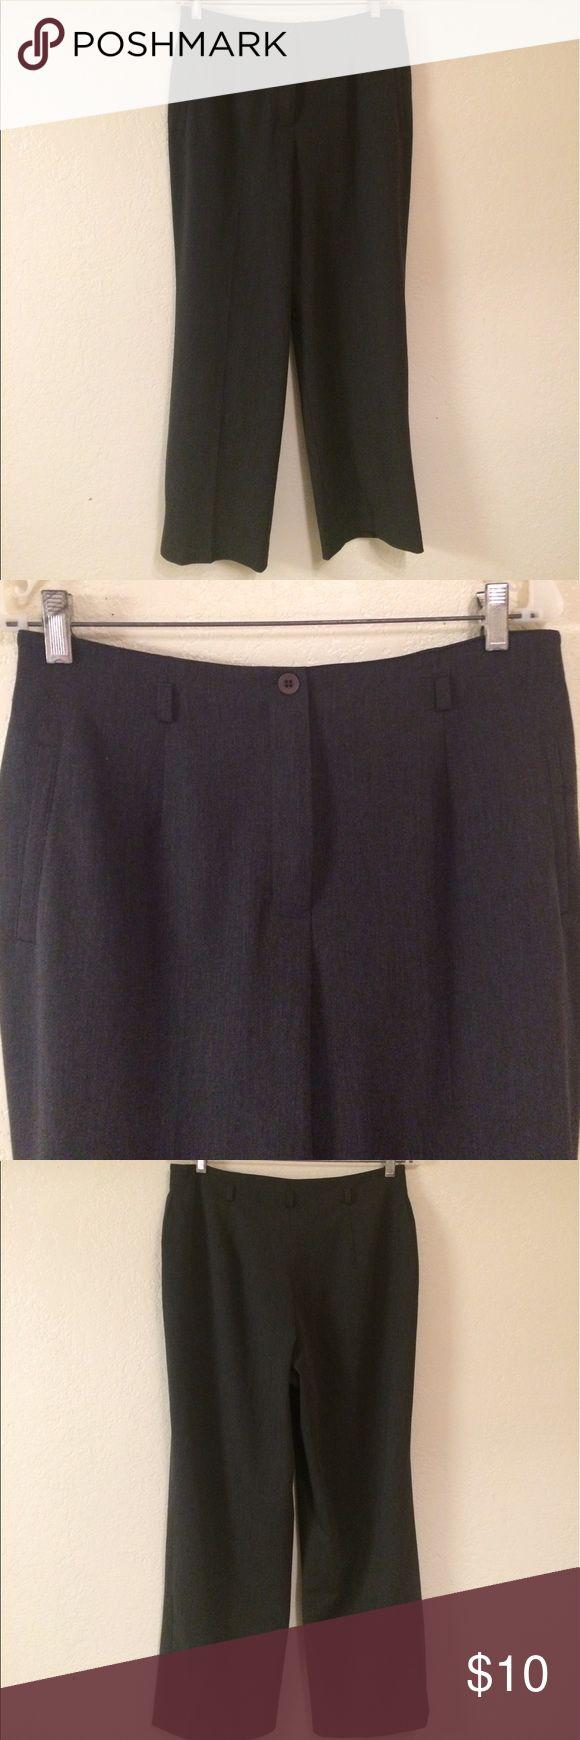 Jones New York Professional Dress Slacks / Pants Jones New York Professional Dress Slacks / Pants 12P Jones New York Pants